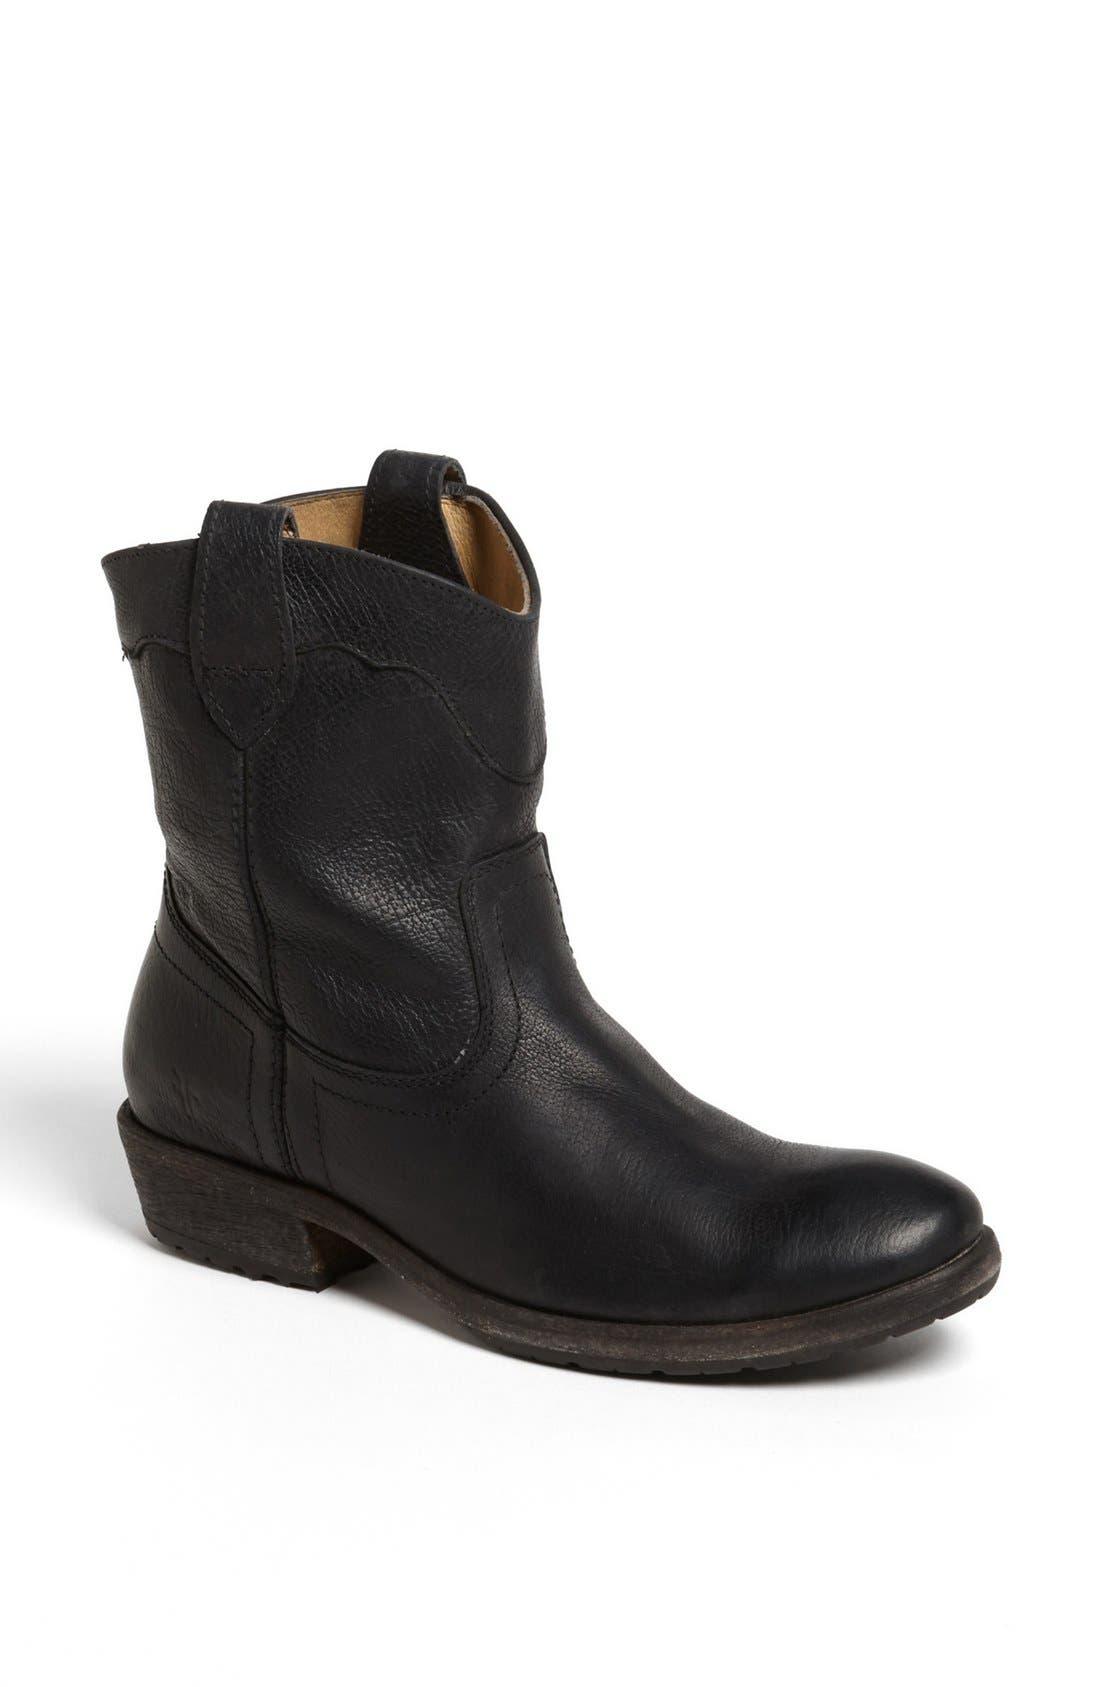 Alternate Image 1 Selected - Frye 'Carson Lug' Short Boot